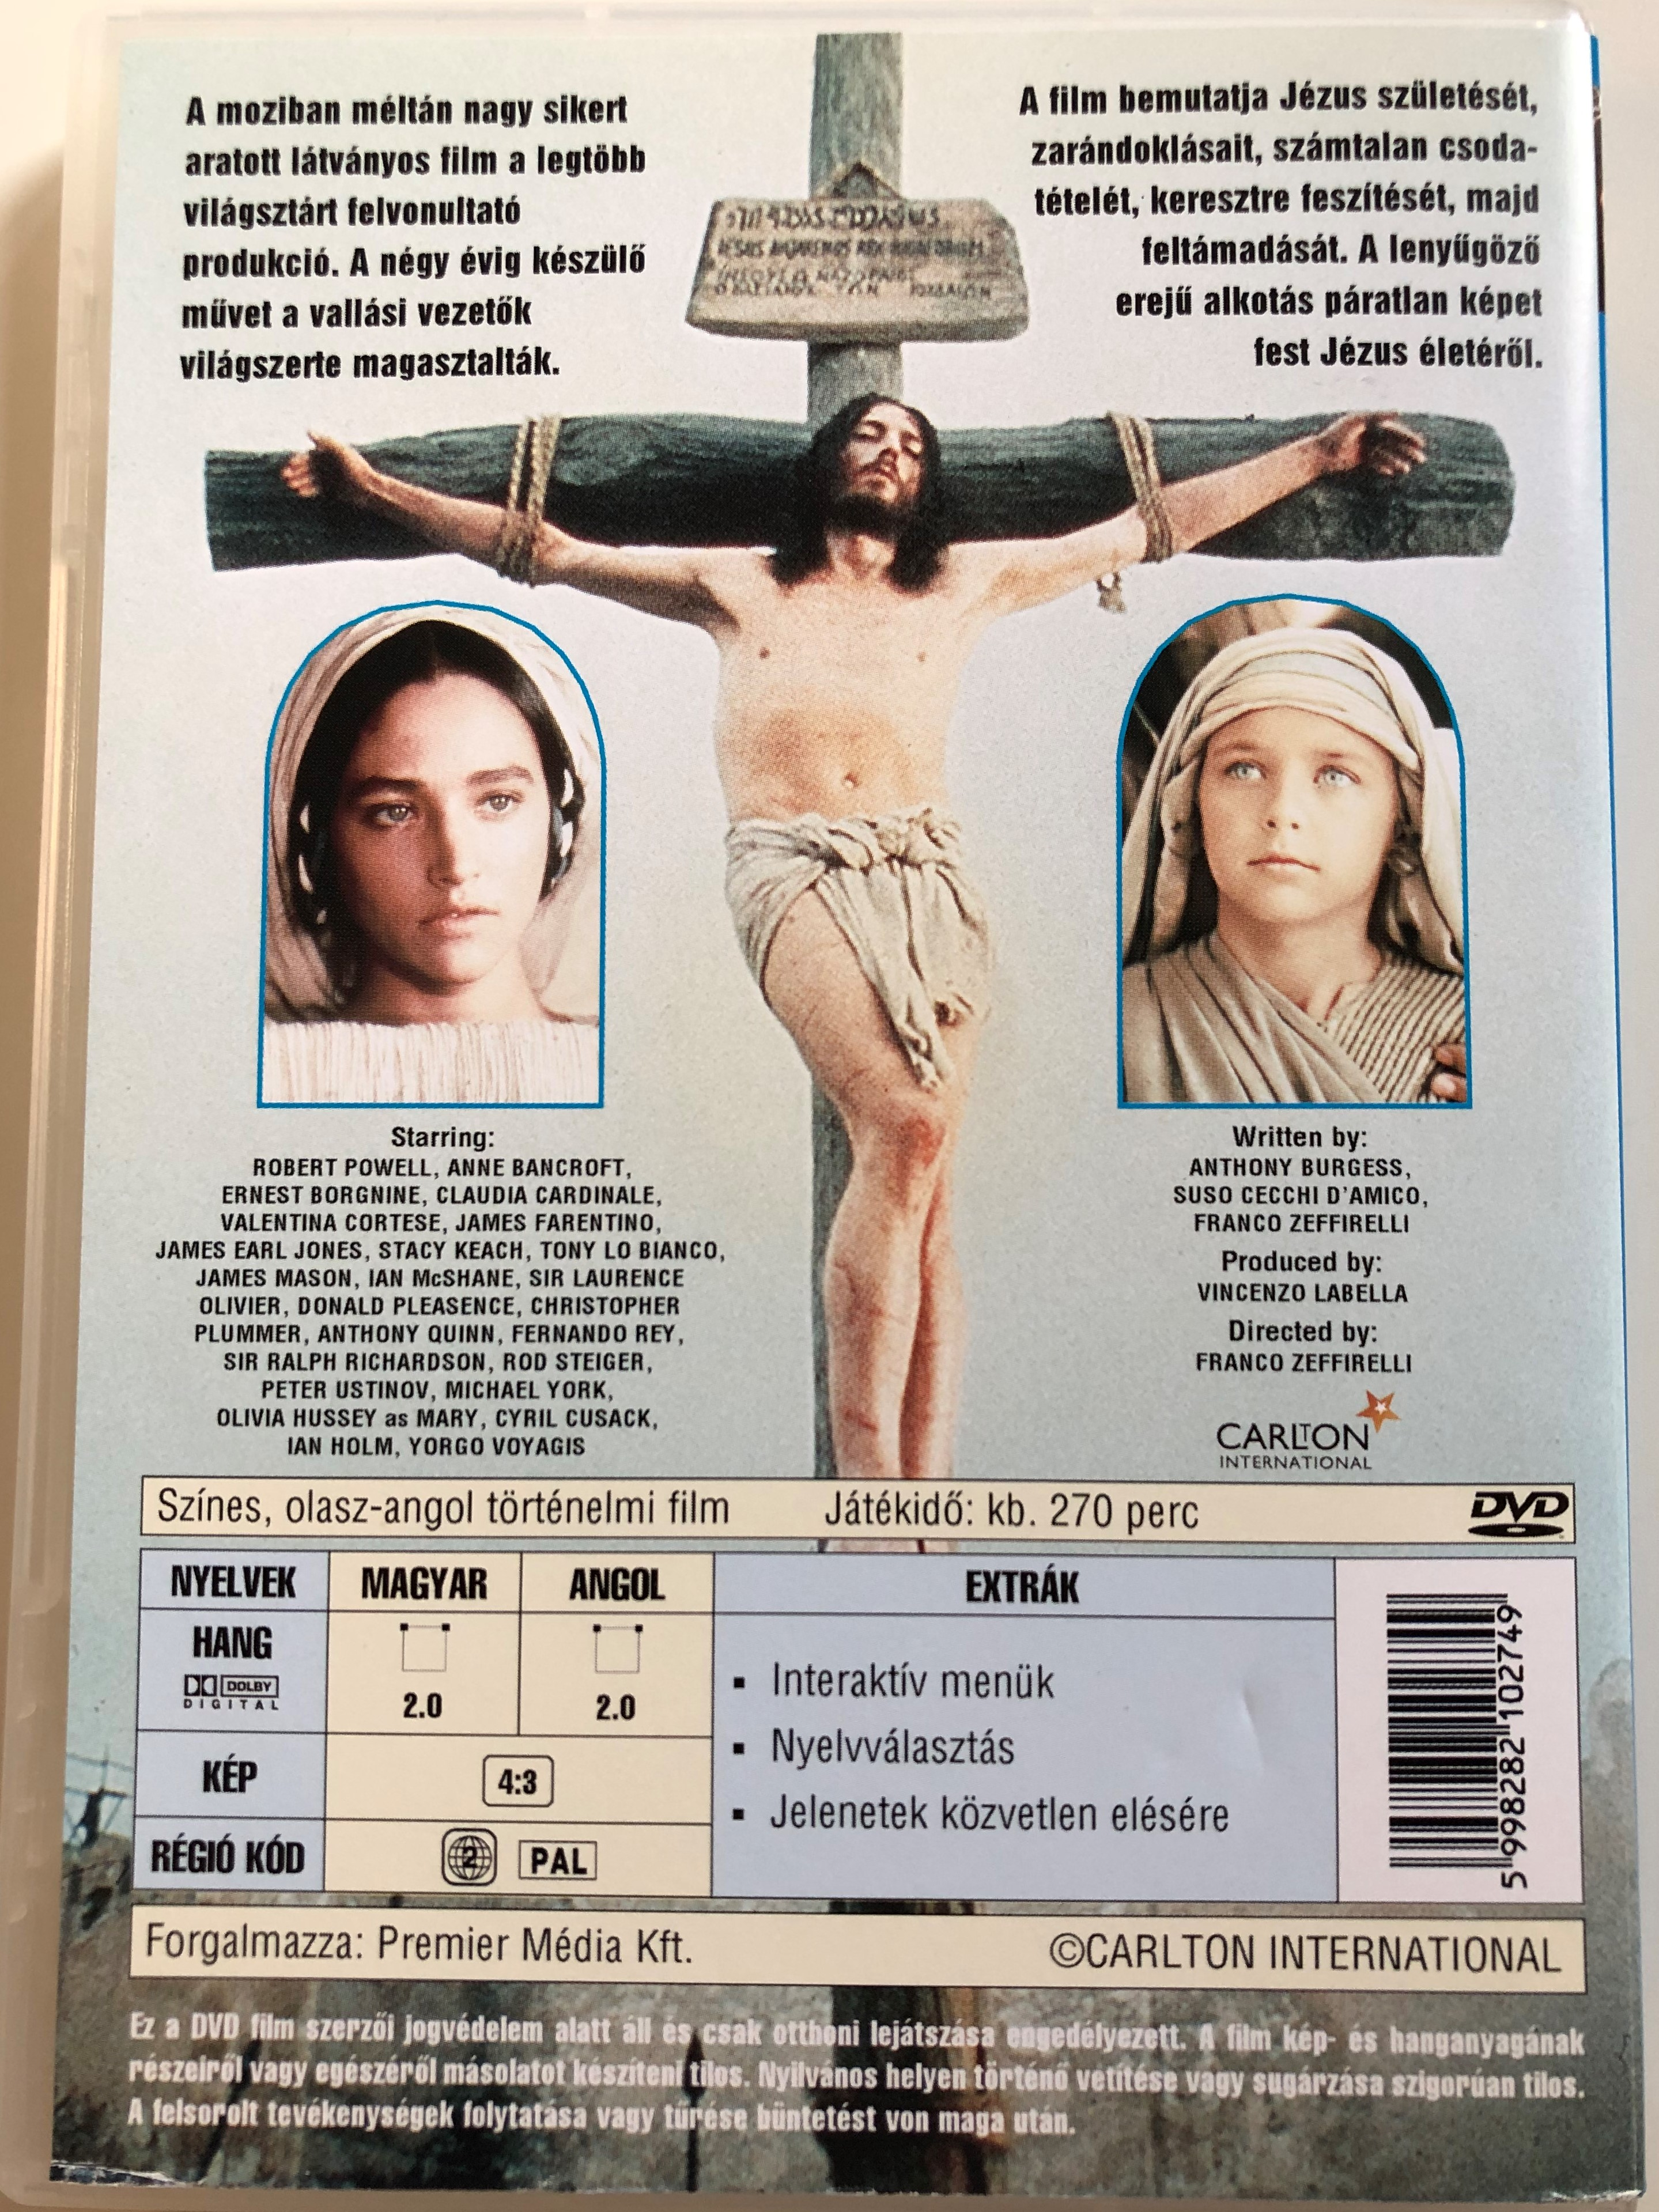 jesus-of-nazareth-dvd-1977-a-n-z-reti-j-zus-directed-by-franco-zeffirelli-2.jpg